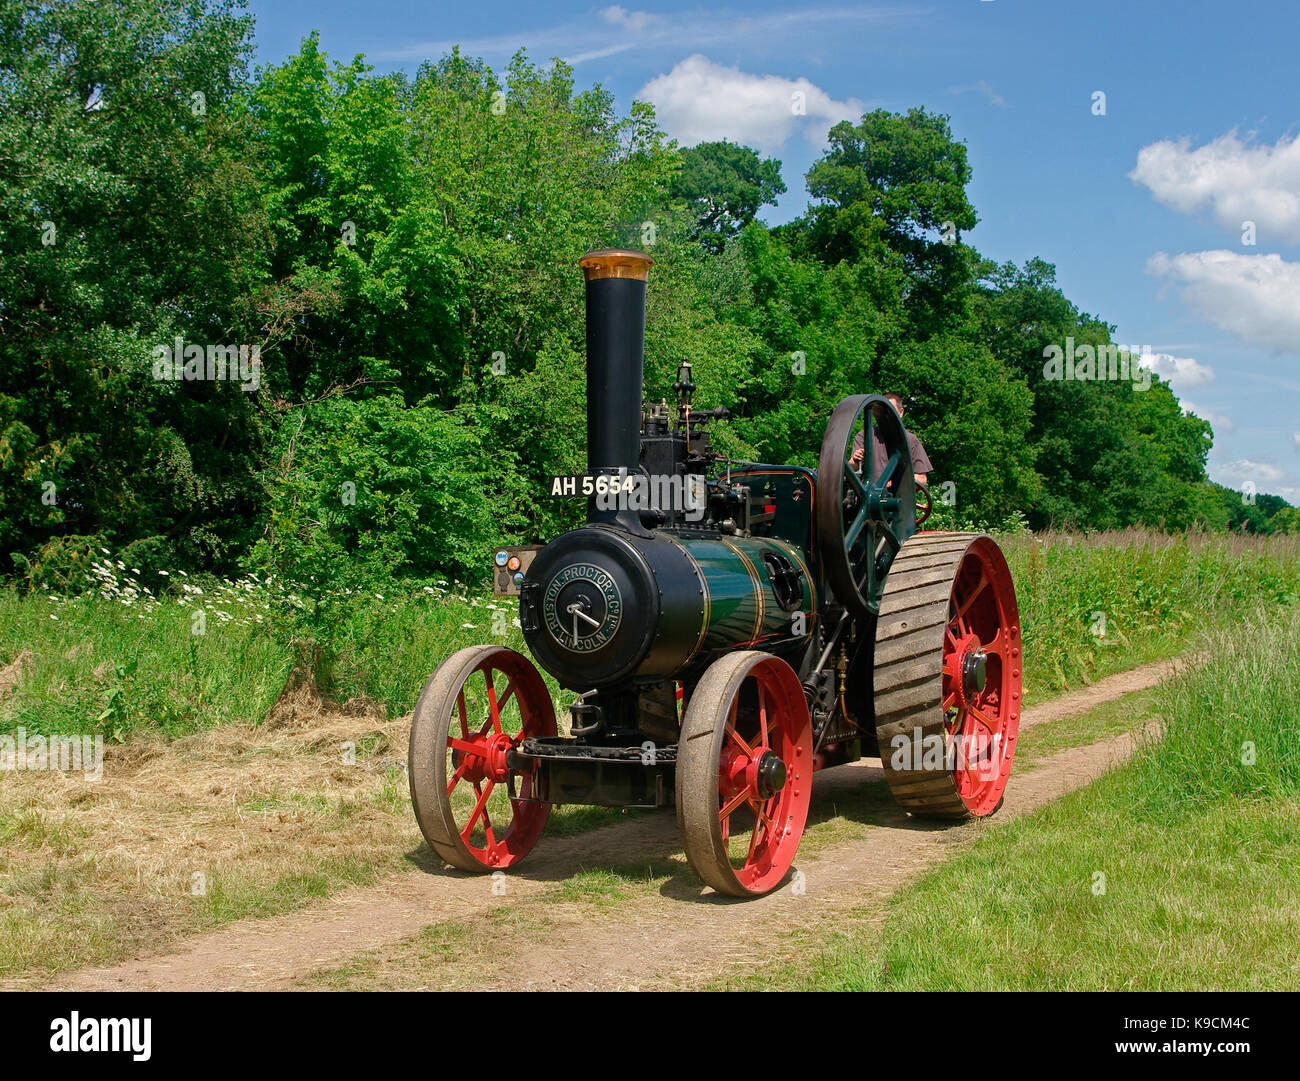 1908 Ruston Proctor Traction Engine - Stock Image